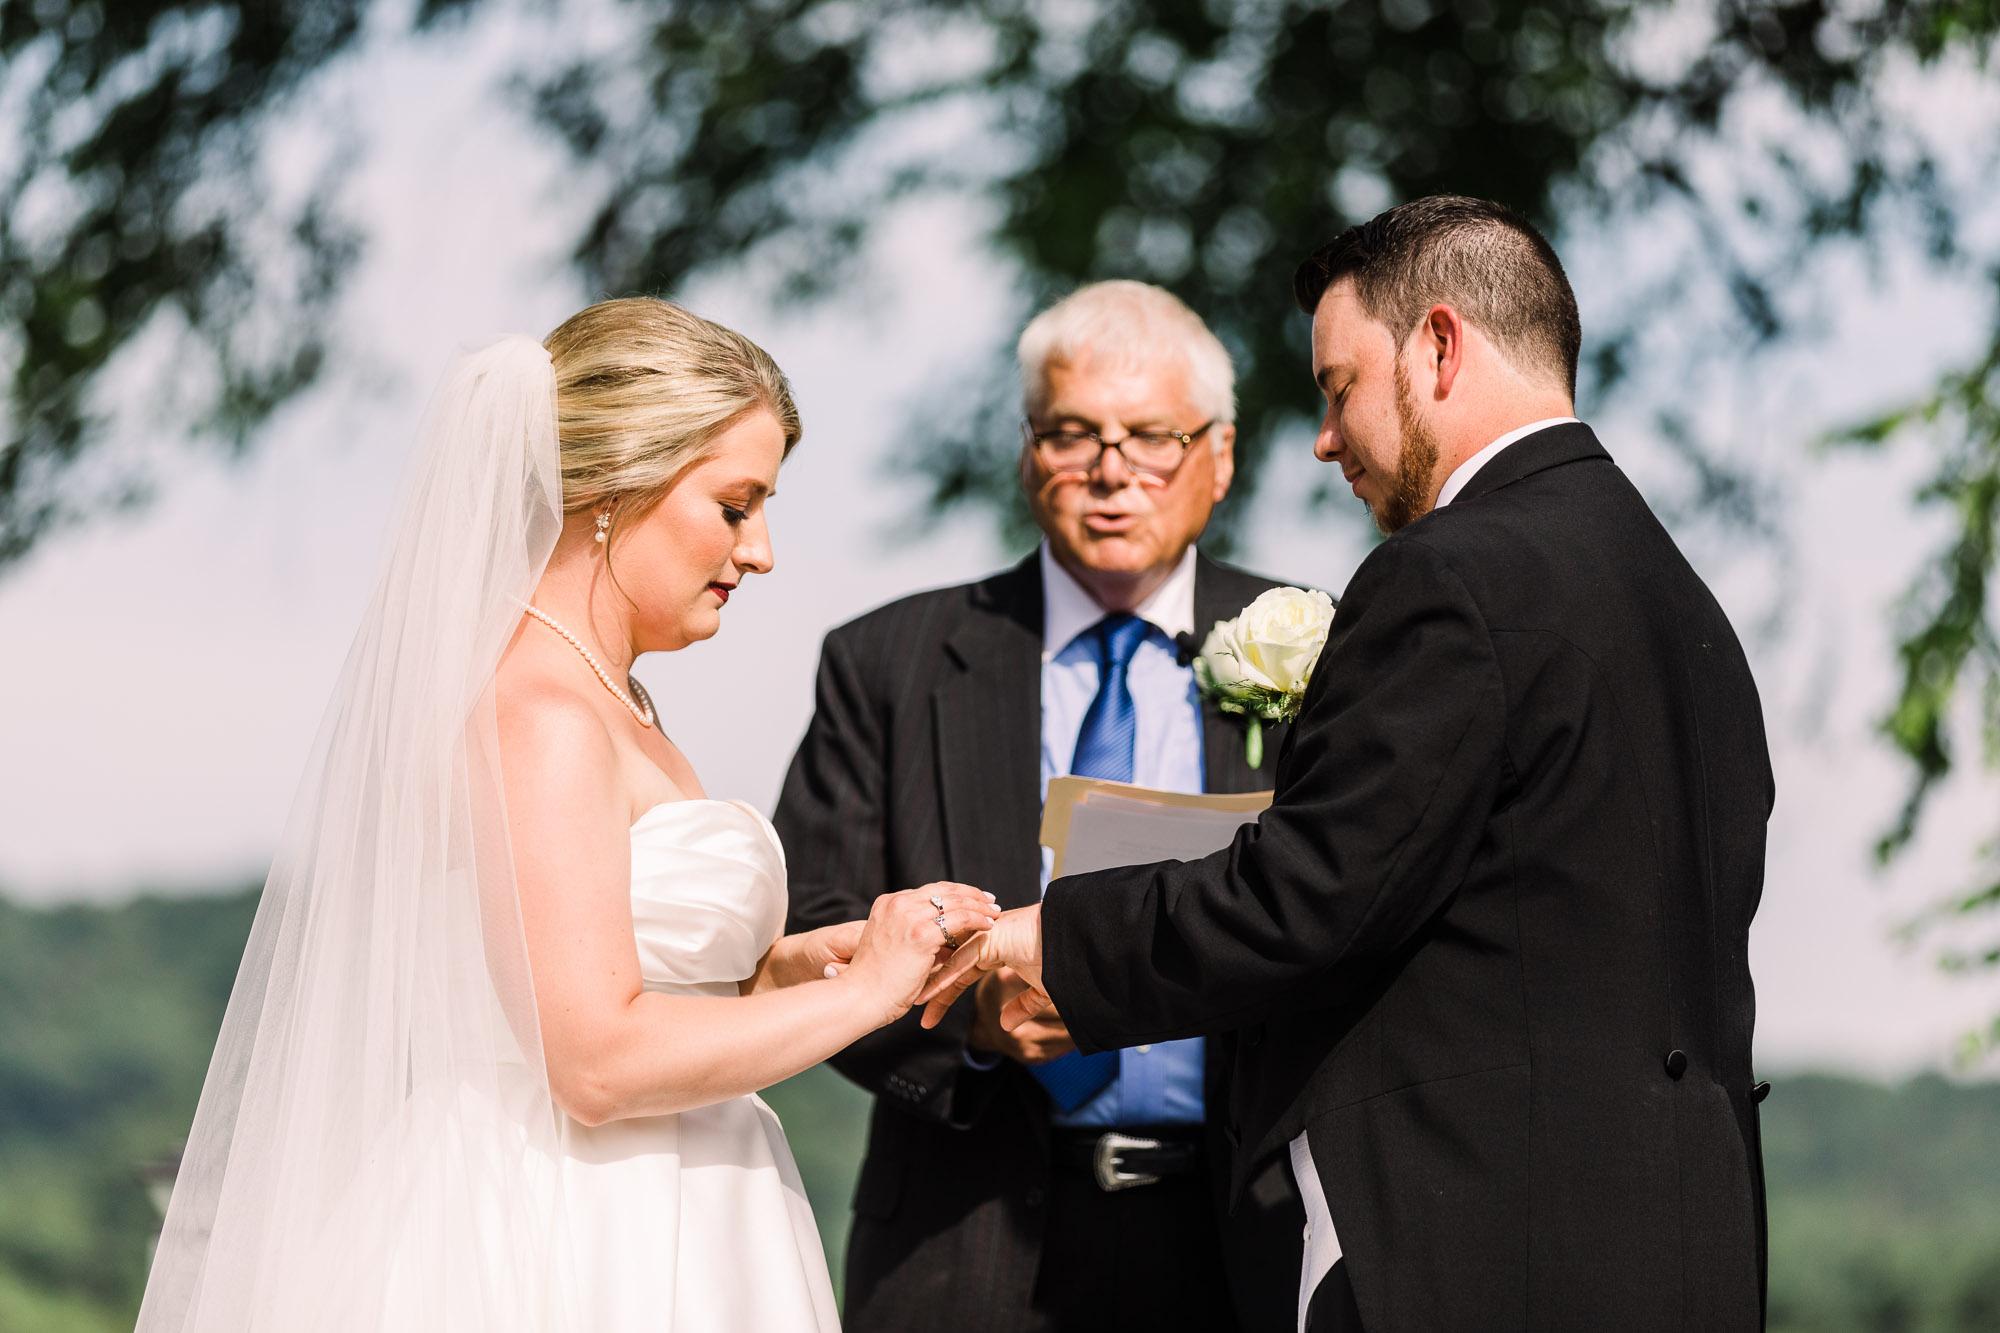 isle-of-que-wedding-3881.jpg